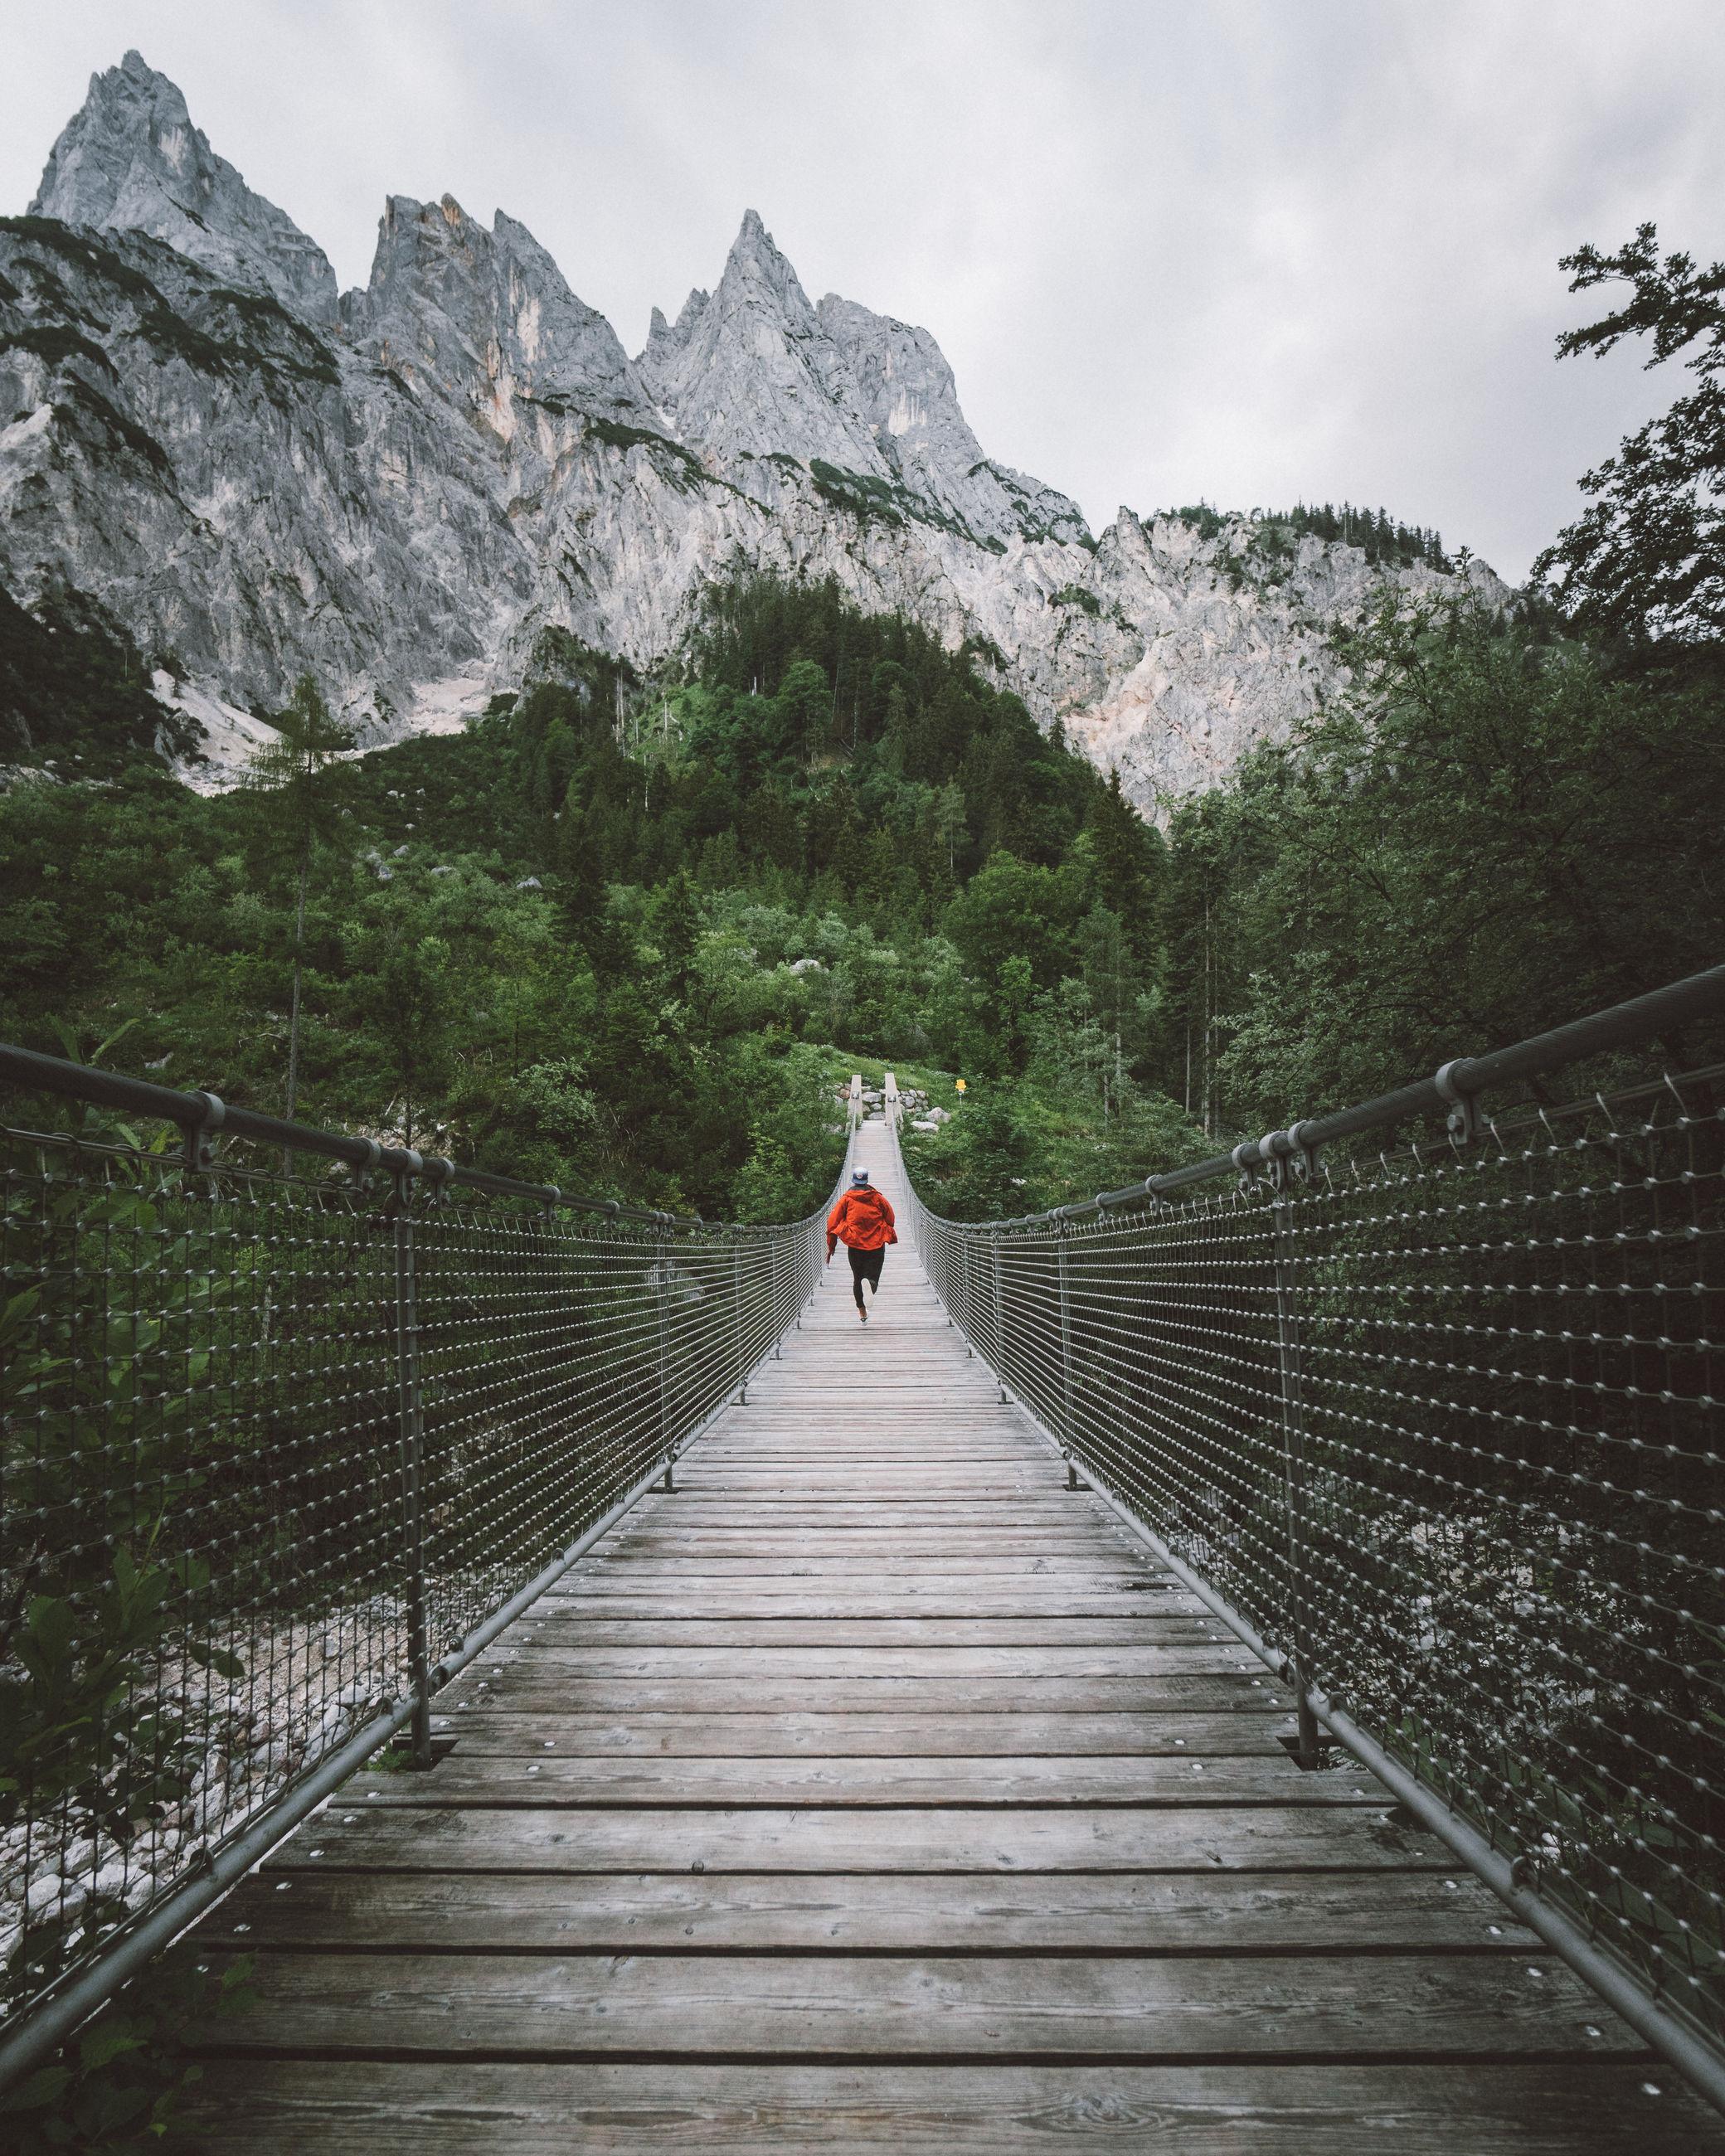 Man running on footbridge against mountains